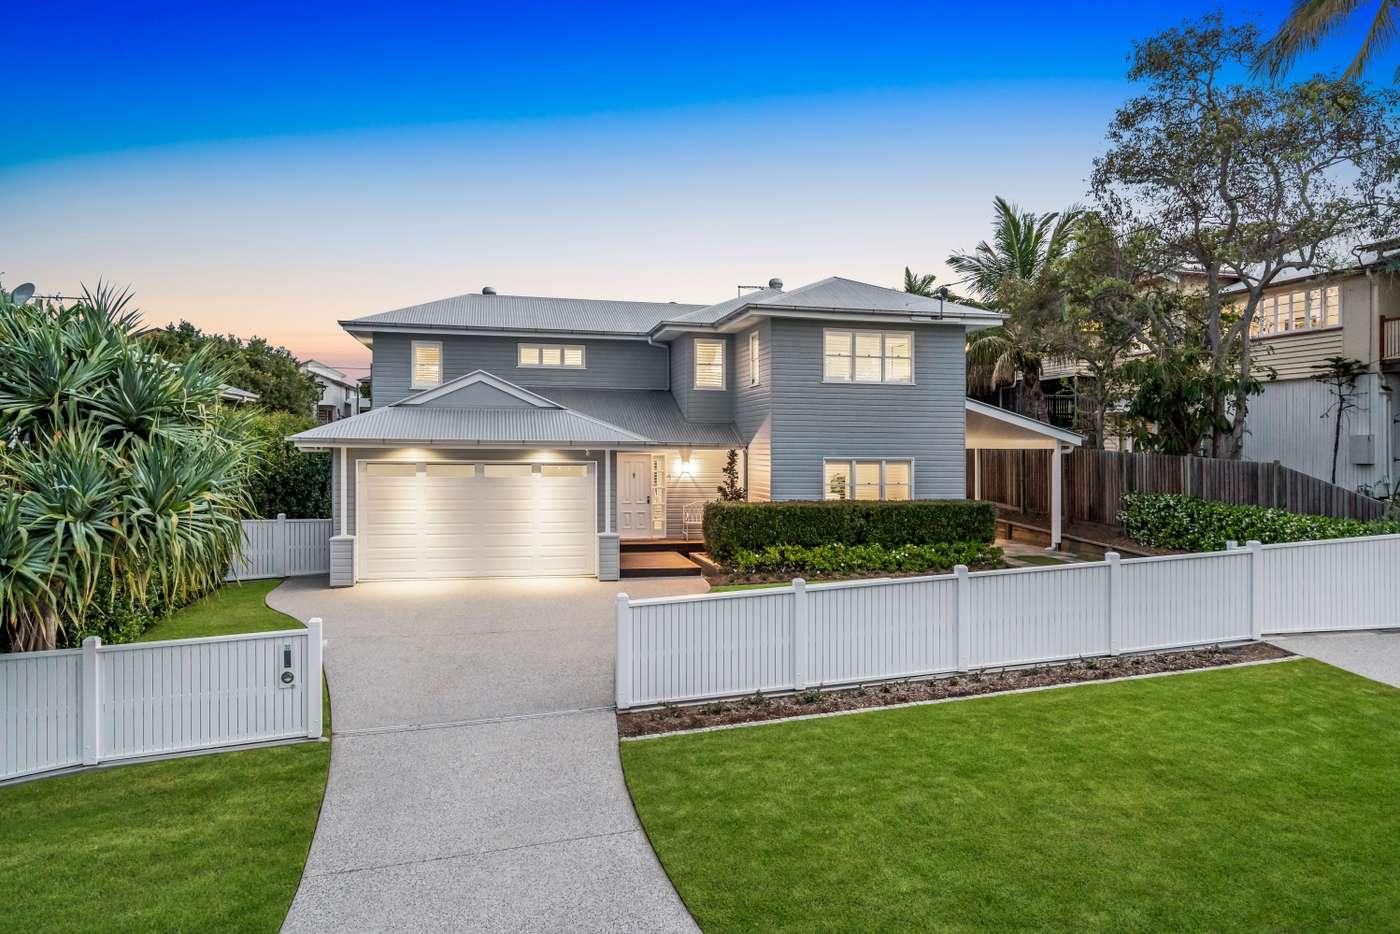 Main view of Homely house listing, 32 Shepherd Street, Wynnum QLD 4178